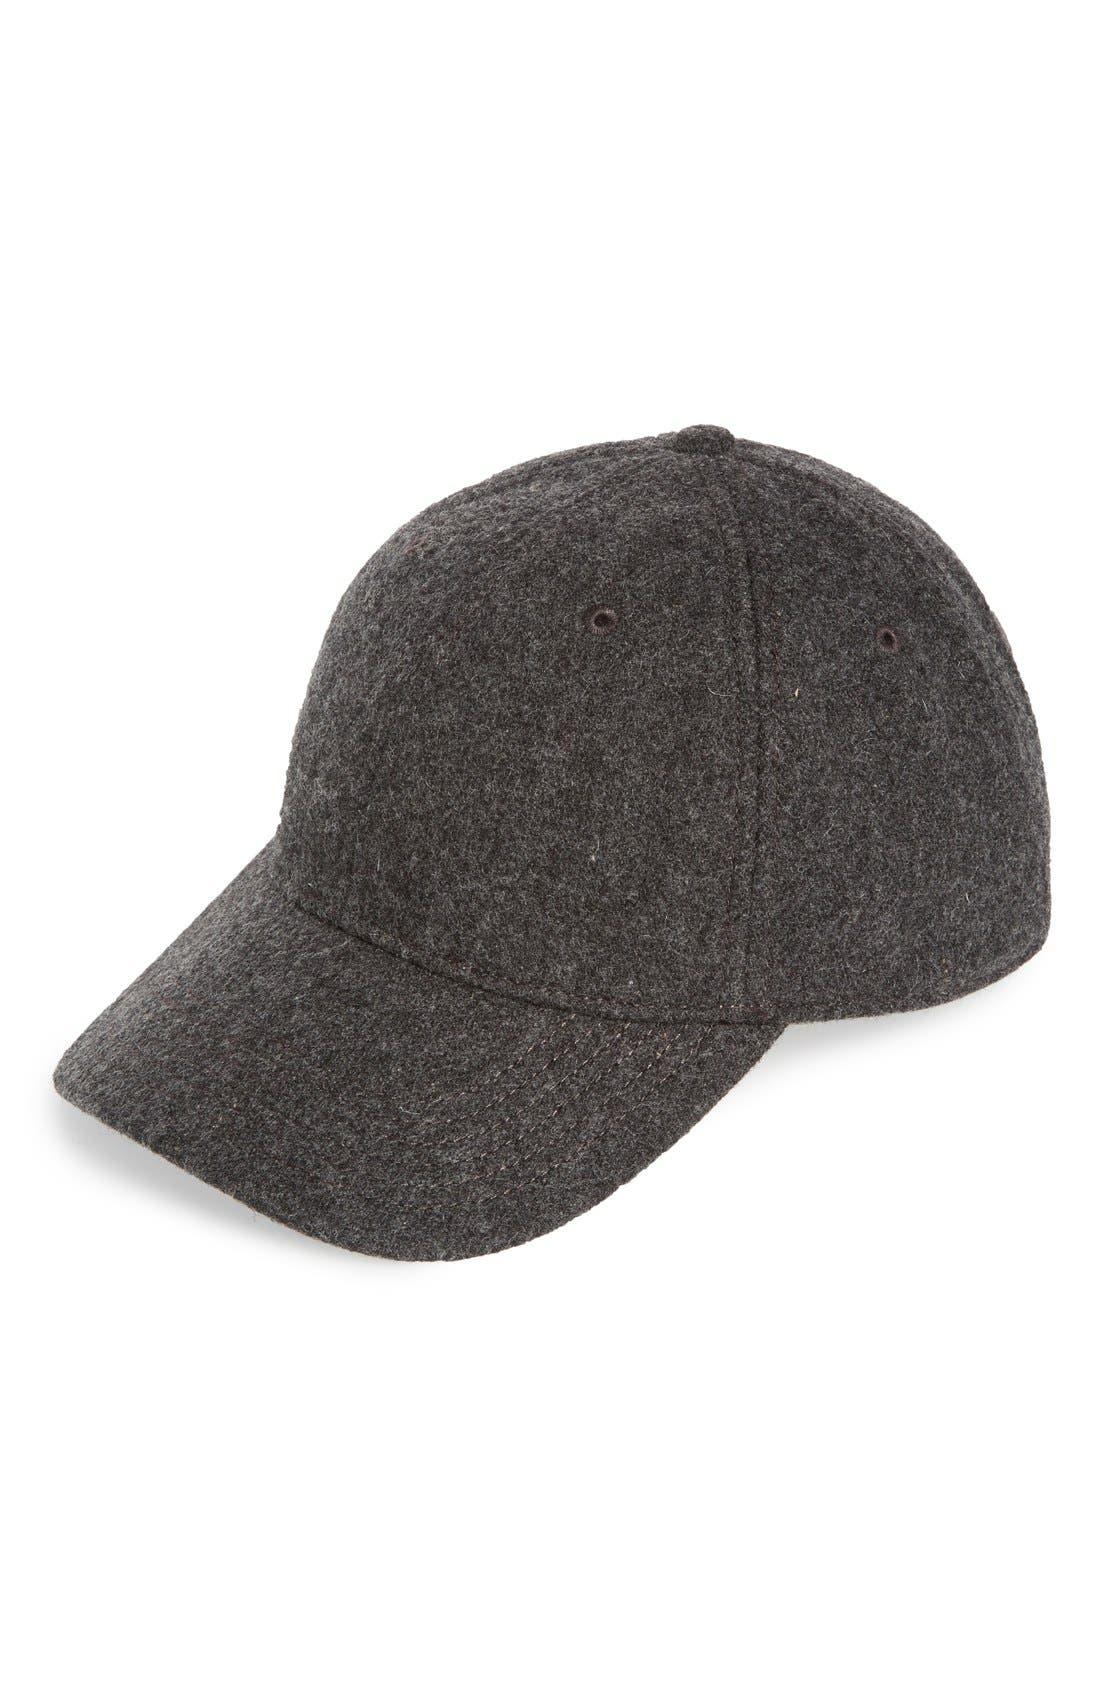 Wool Blend Baseball Cap, Main, color, 020